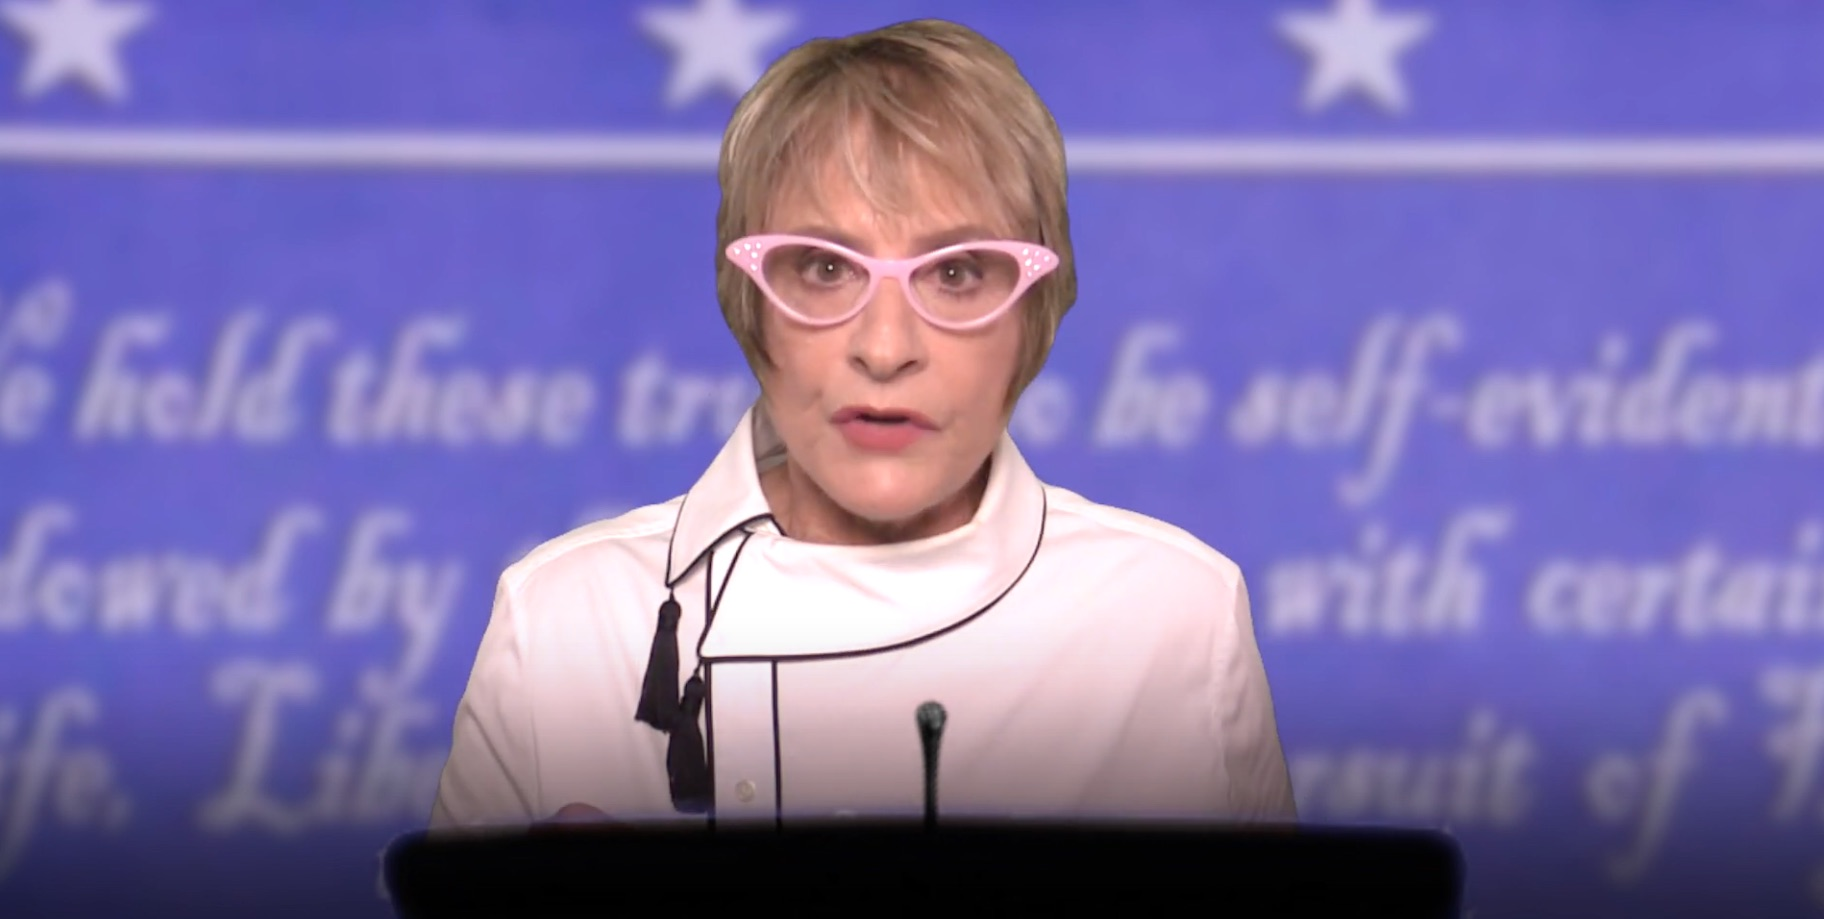 Broadway star Patti LuPone spoofs Randy Rainbow